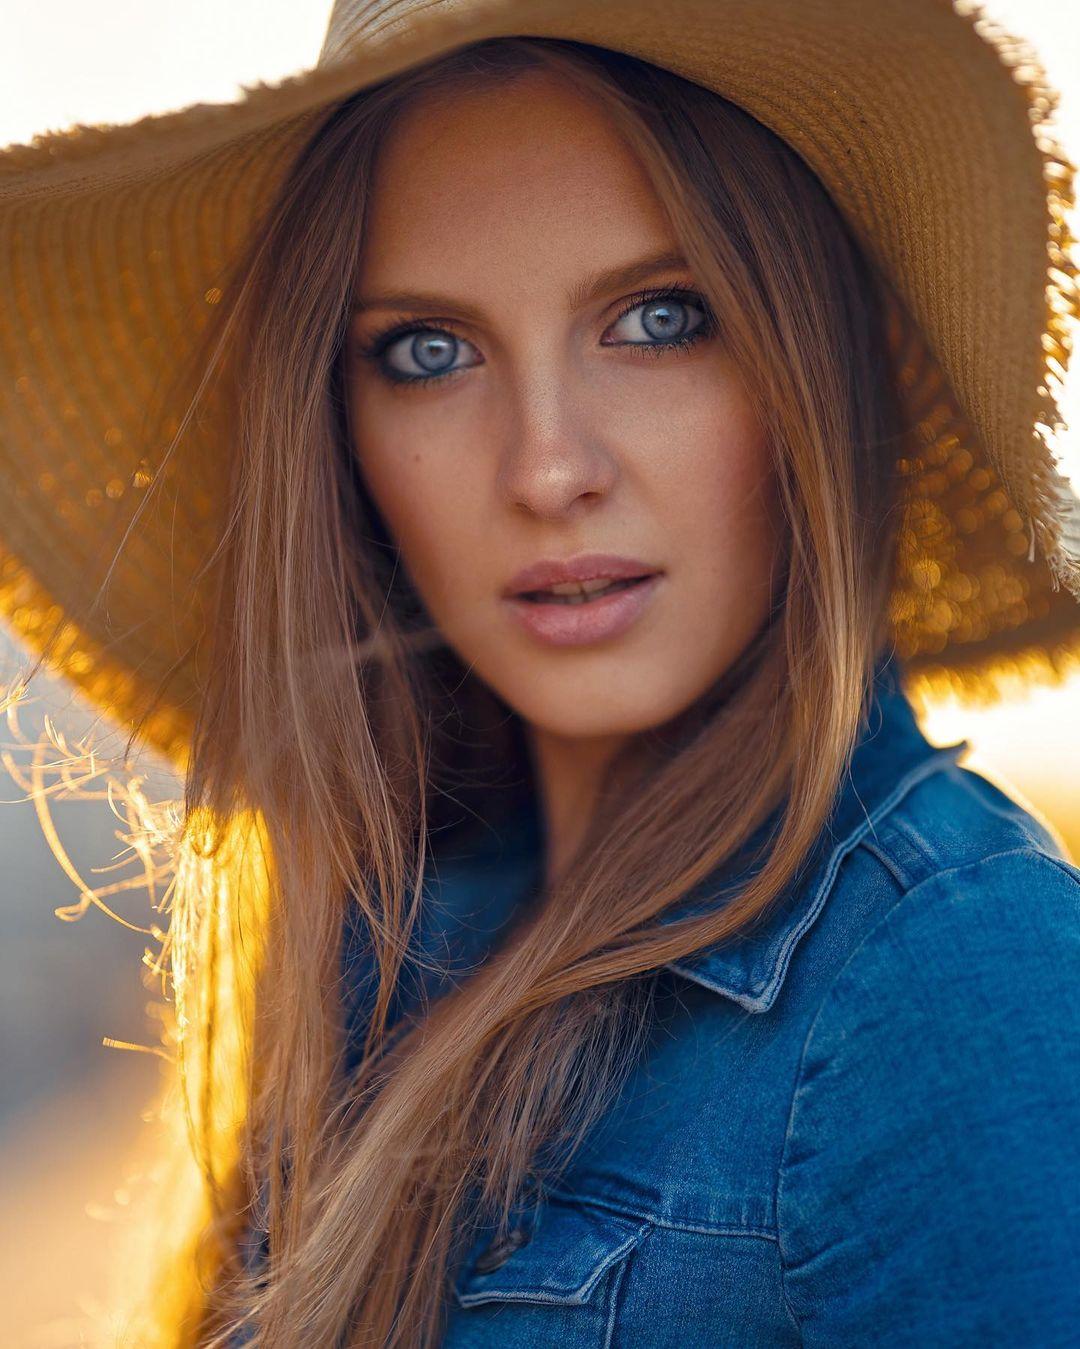 Nicole-marie-j-Wallpapers-Insta-Fit-Bio-8